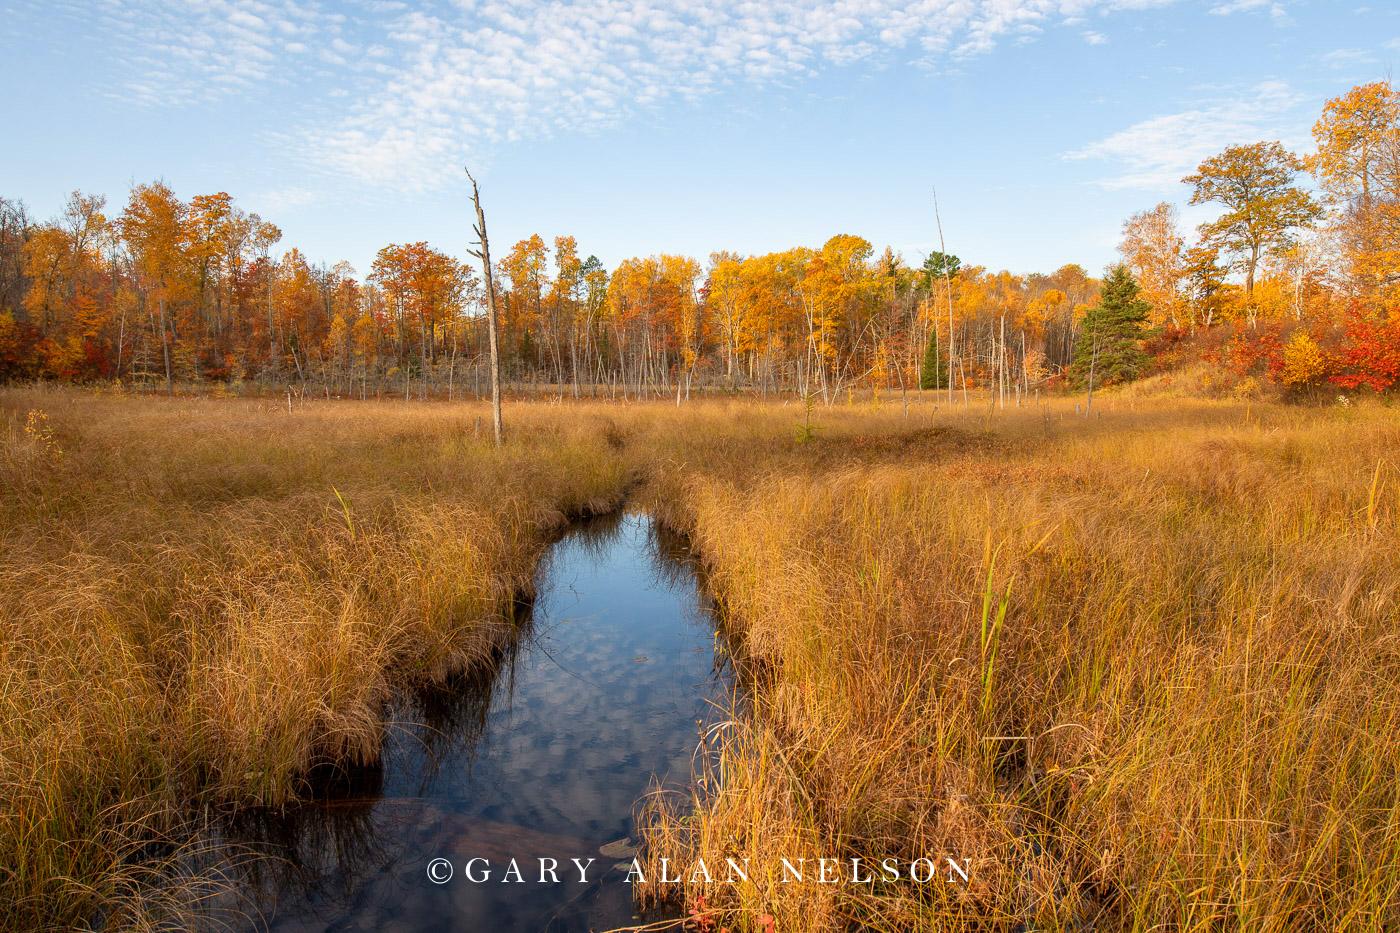 Autumn colors around a beaver pond, Savannah Portage State Park, Minnesota